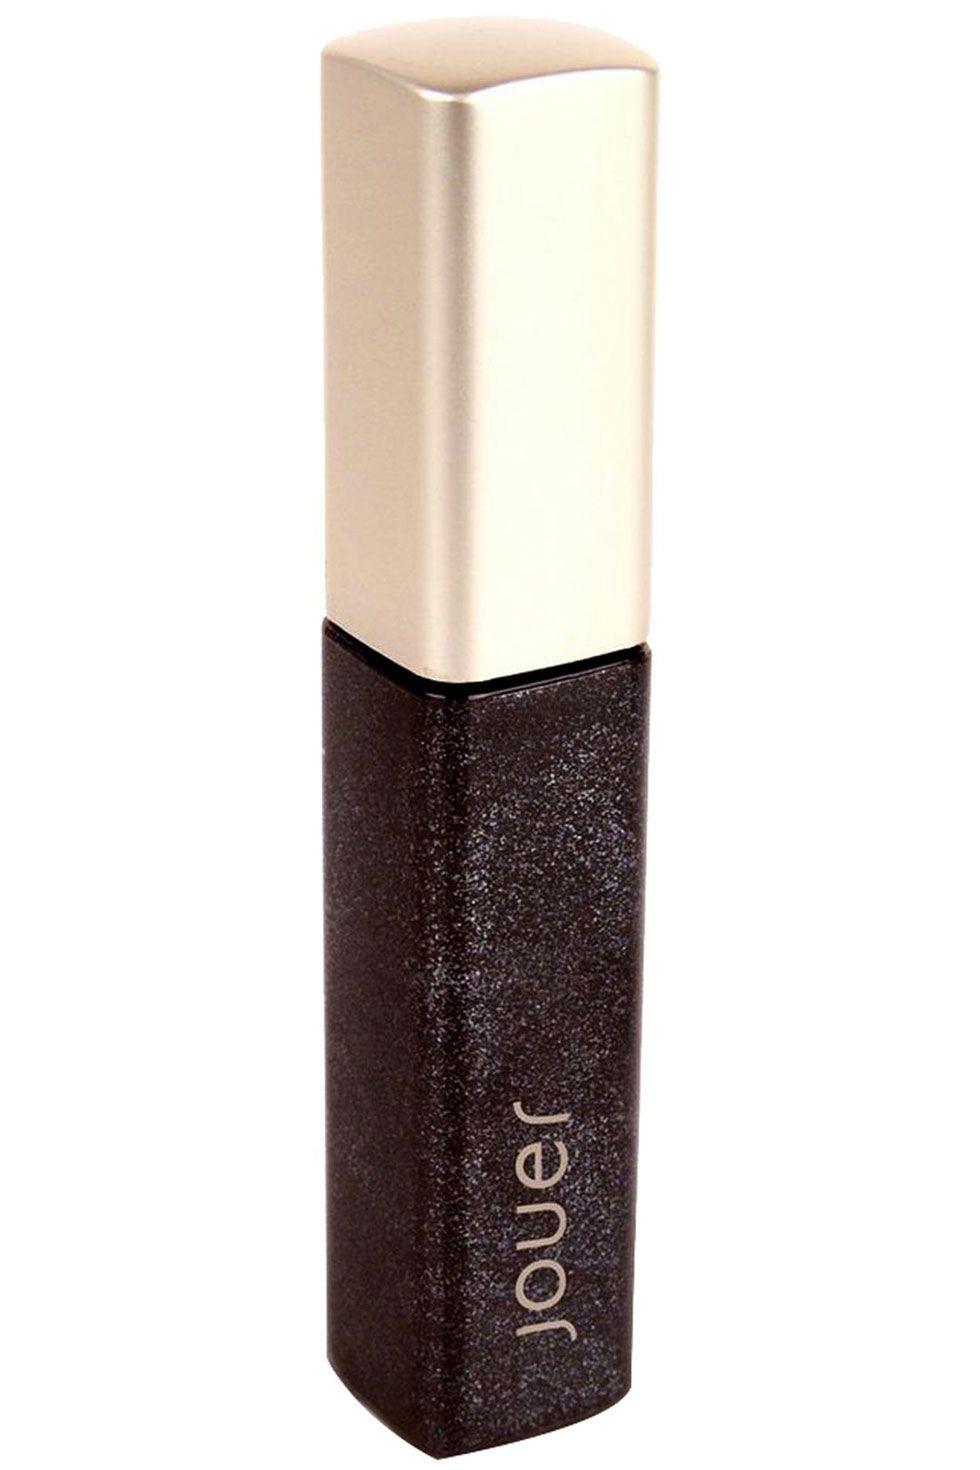 "Jouer Liquid Shimmer Eyeliner in Panther, $22&#x3B; <a target=""_blank"" href=""http://shop.nordstrom.com/s/jouer-liquid-shimmer-eyeliner/3349797"">nordstrom.com</a>"